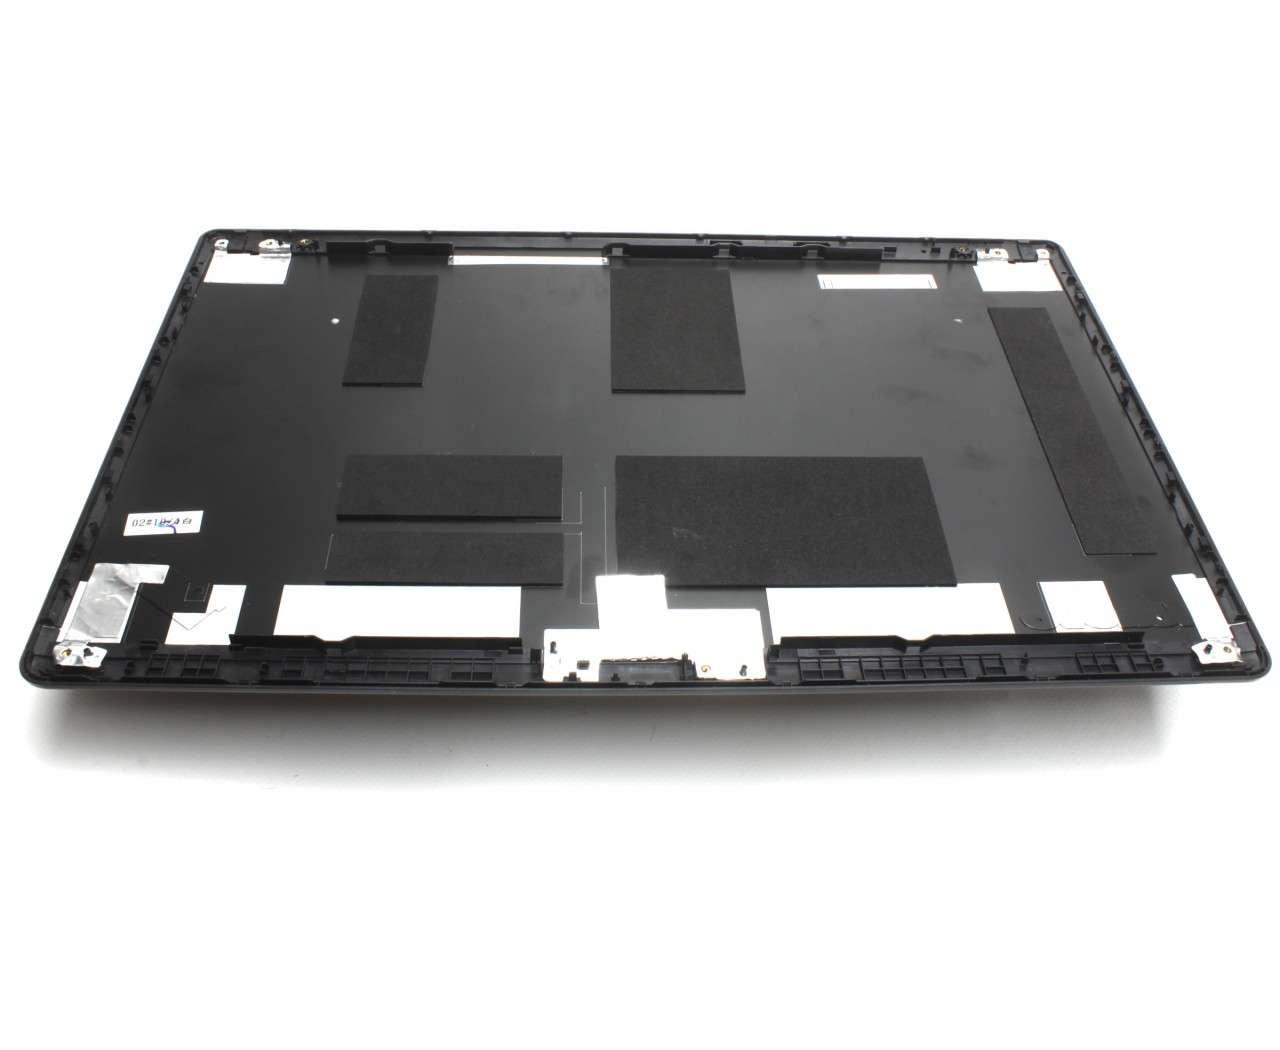 Capac Display BackCover Lenovo ThinkPad Edge E545 Carcasa Display Neagra imagine powerlaptop.ro 2021